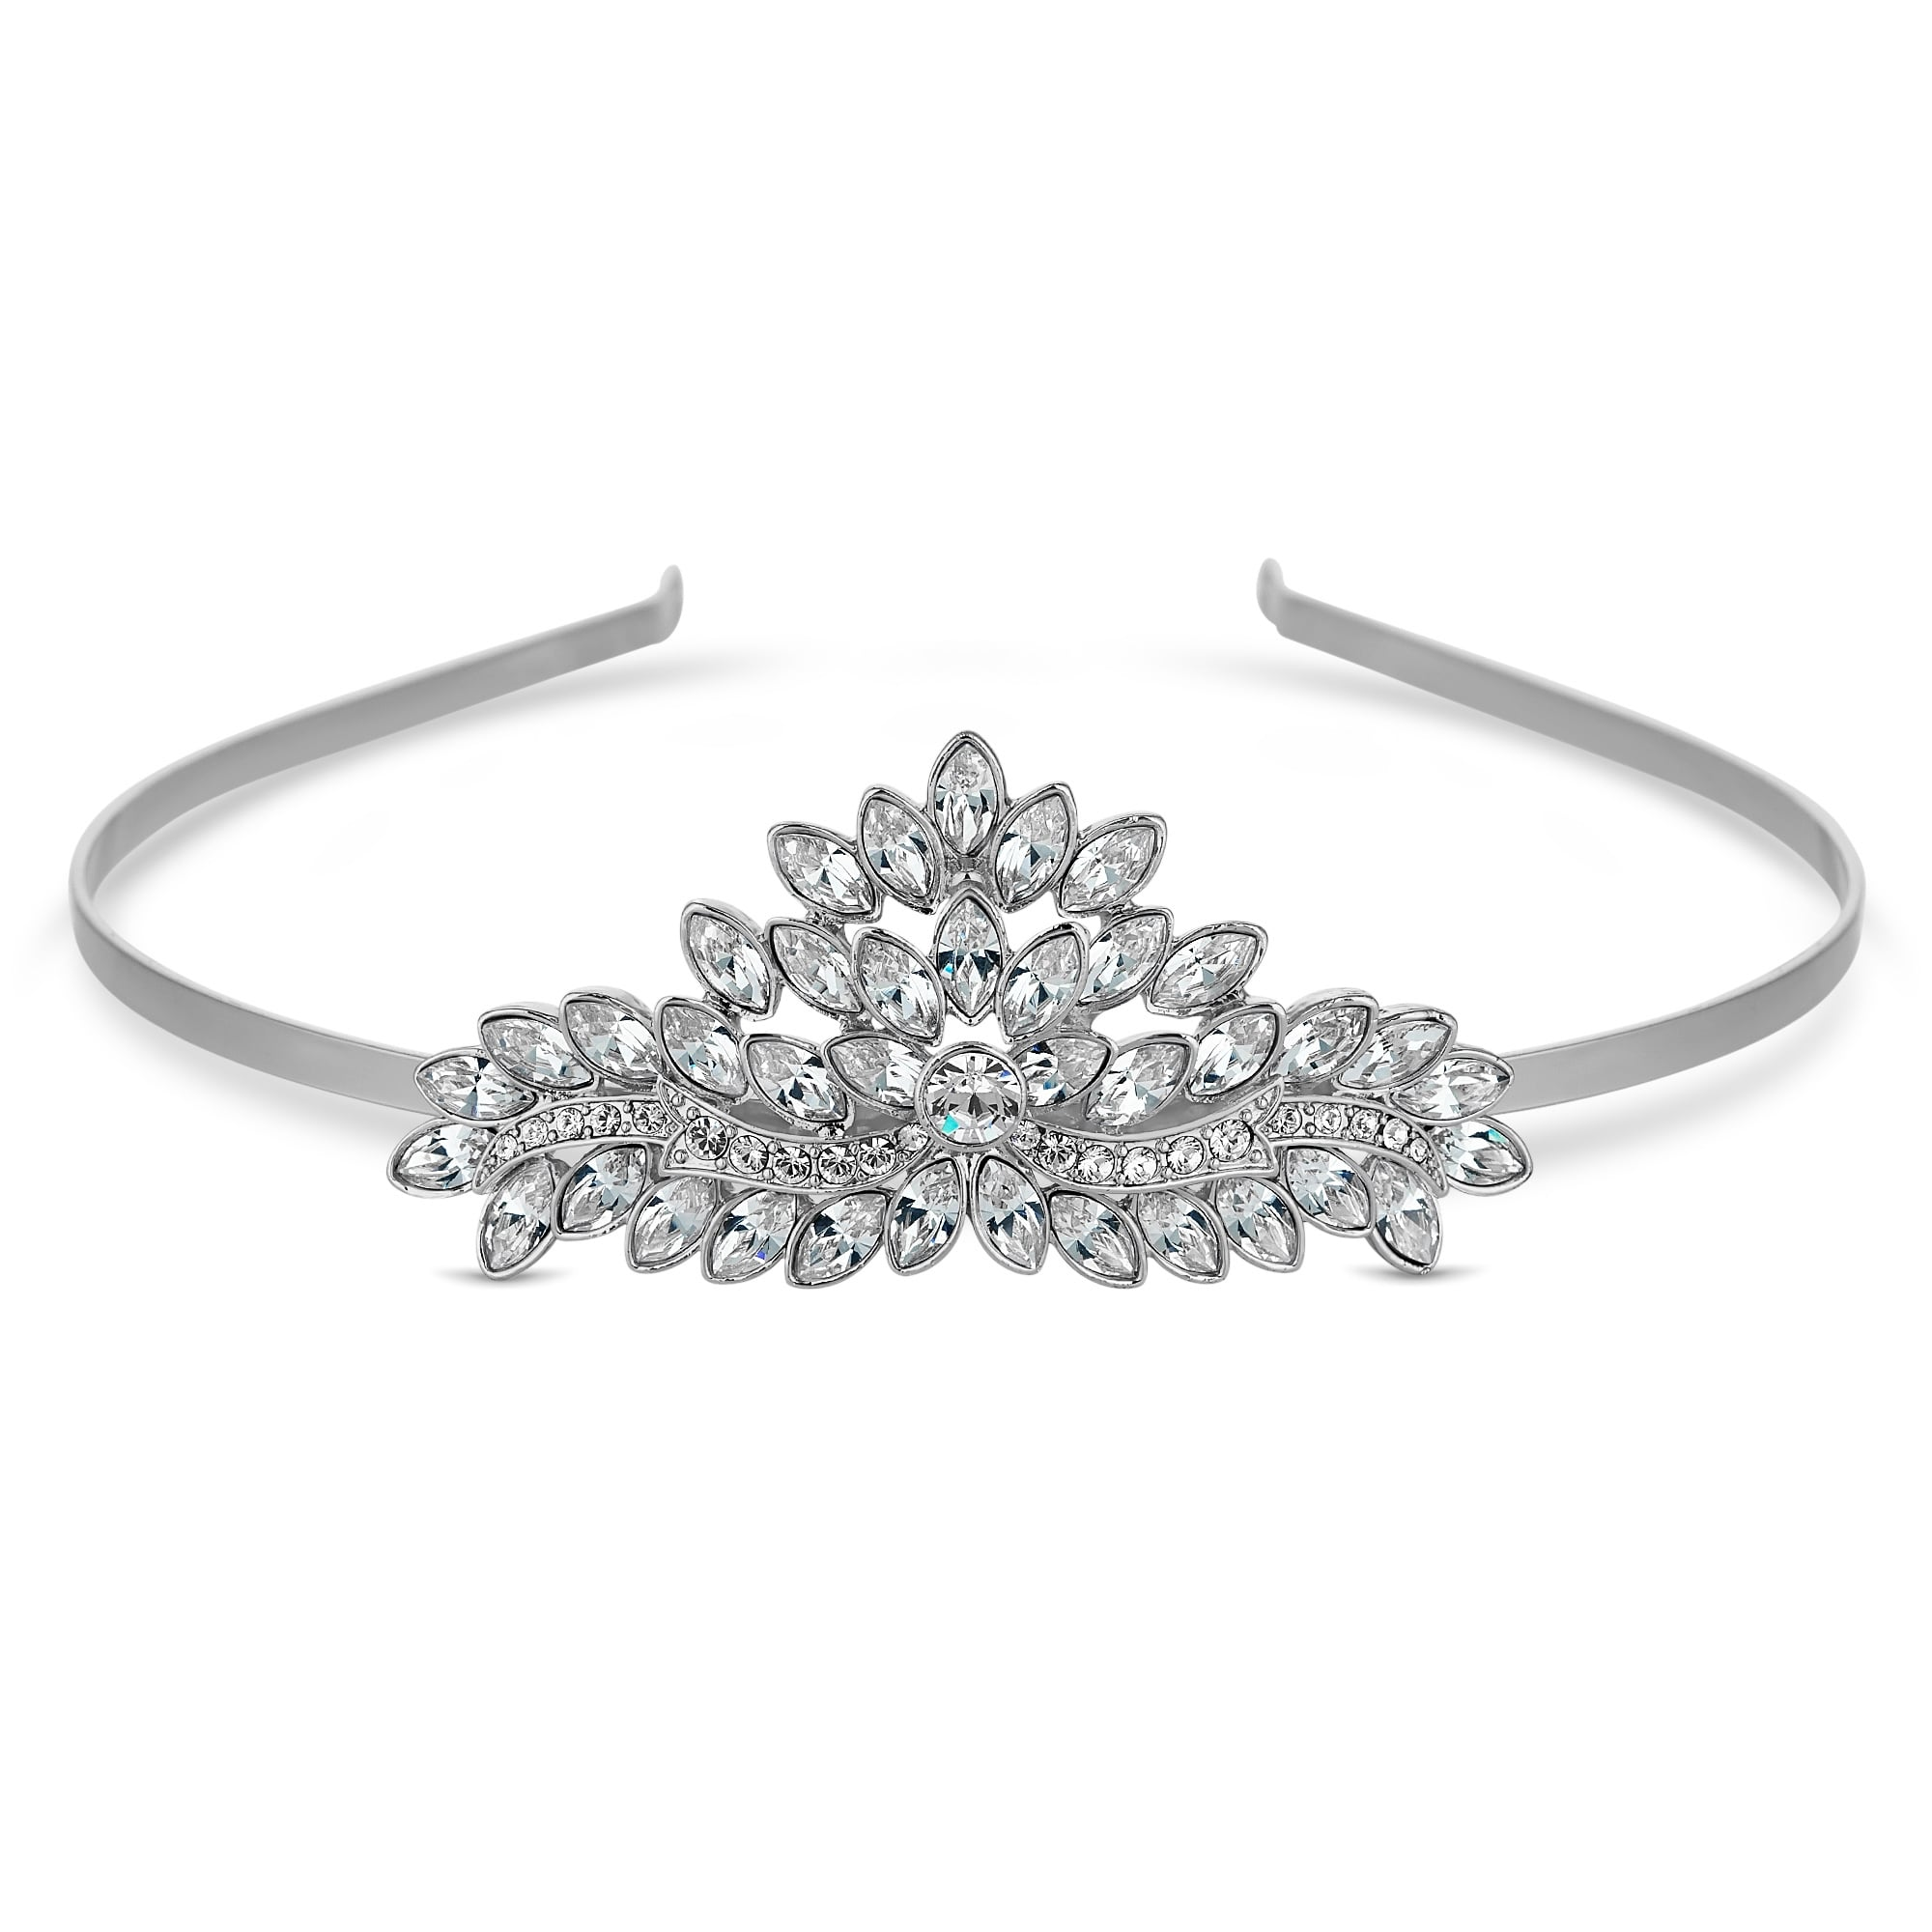 79c1812b58c9 Jon Richard made with Swarovski® crystals Silver Plated Tiara Embellished  With Swarovski® Crystals